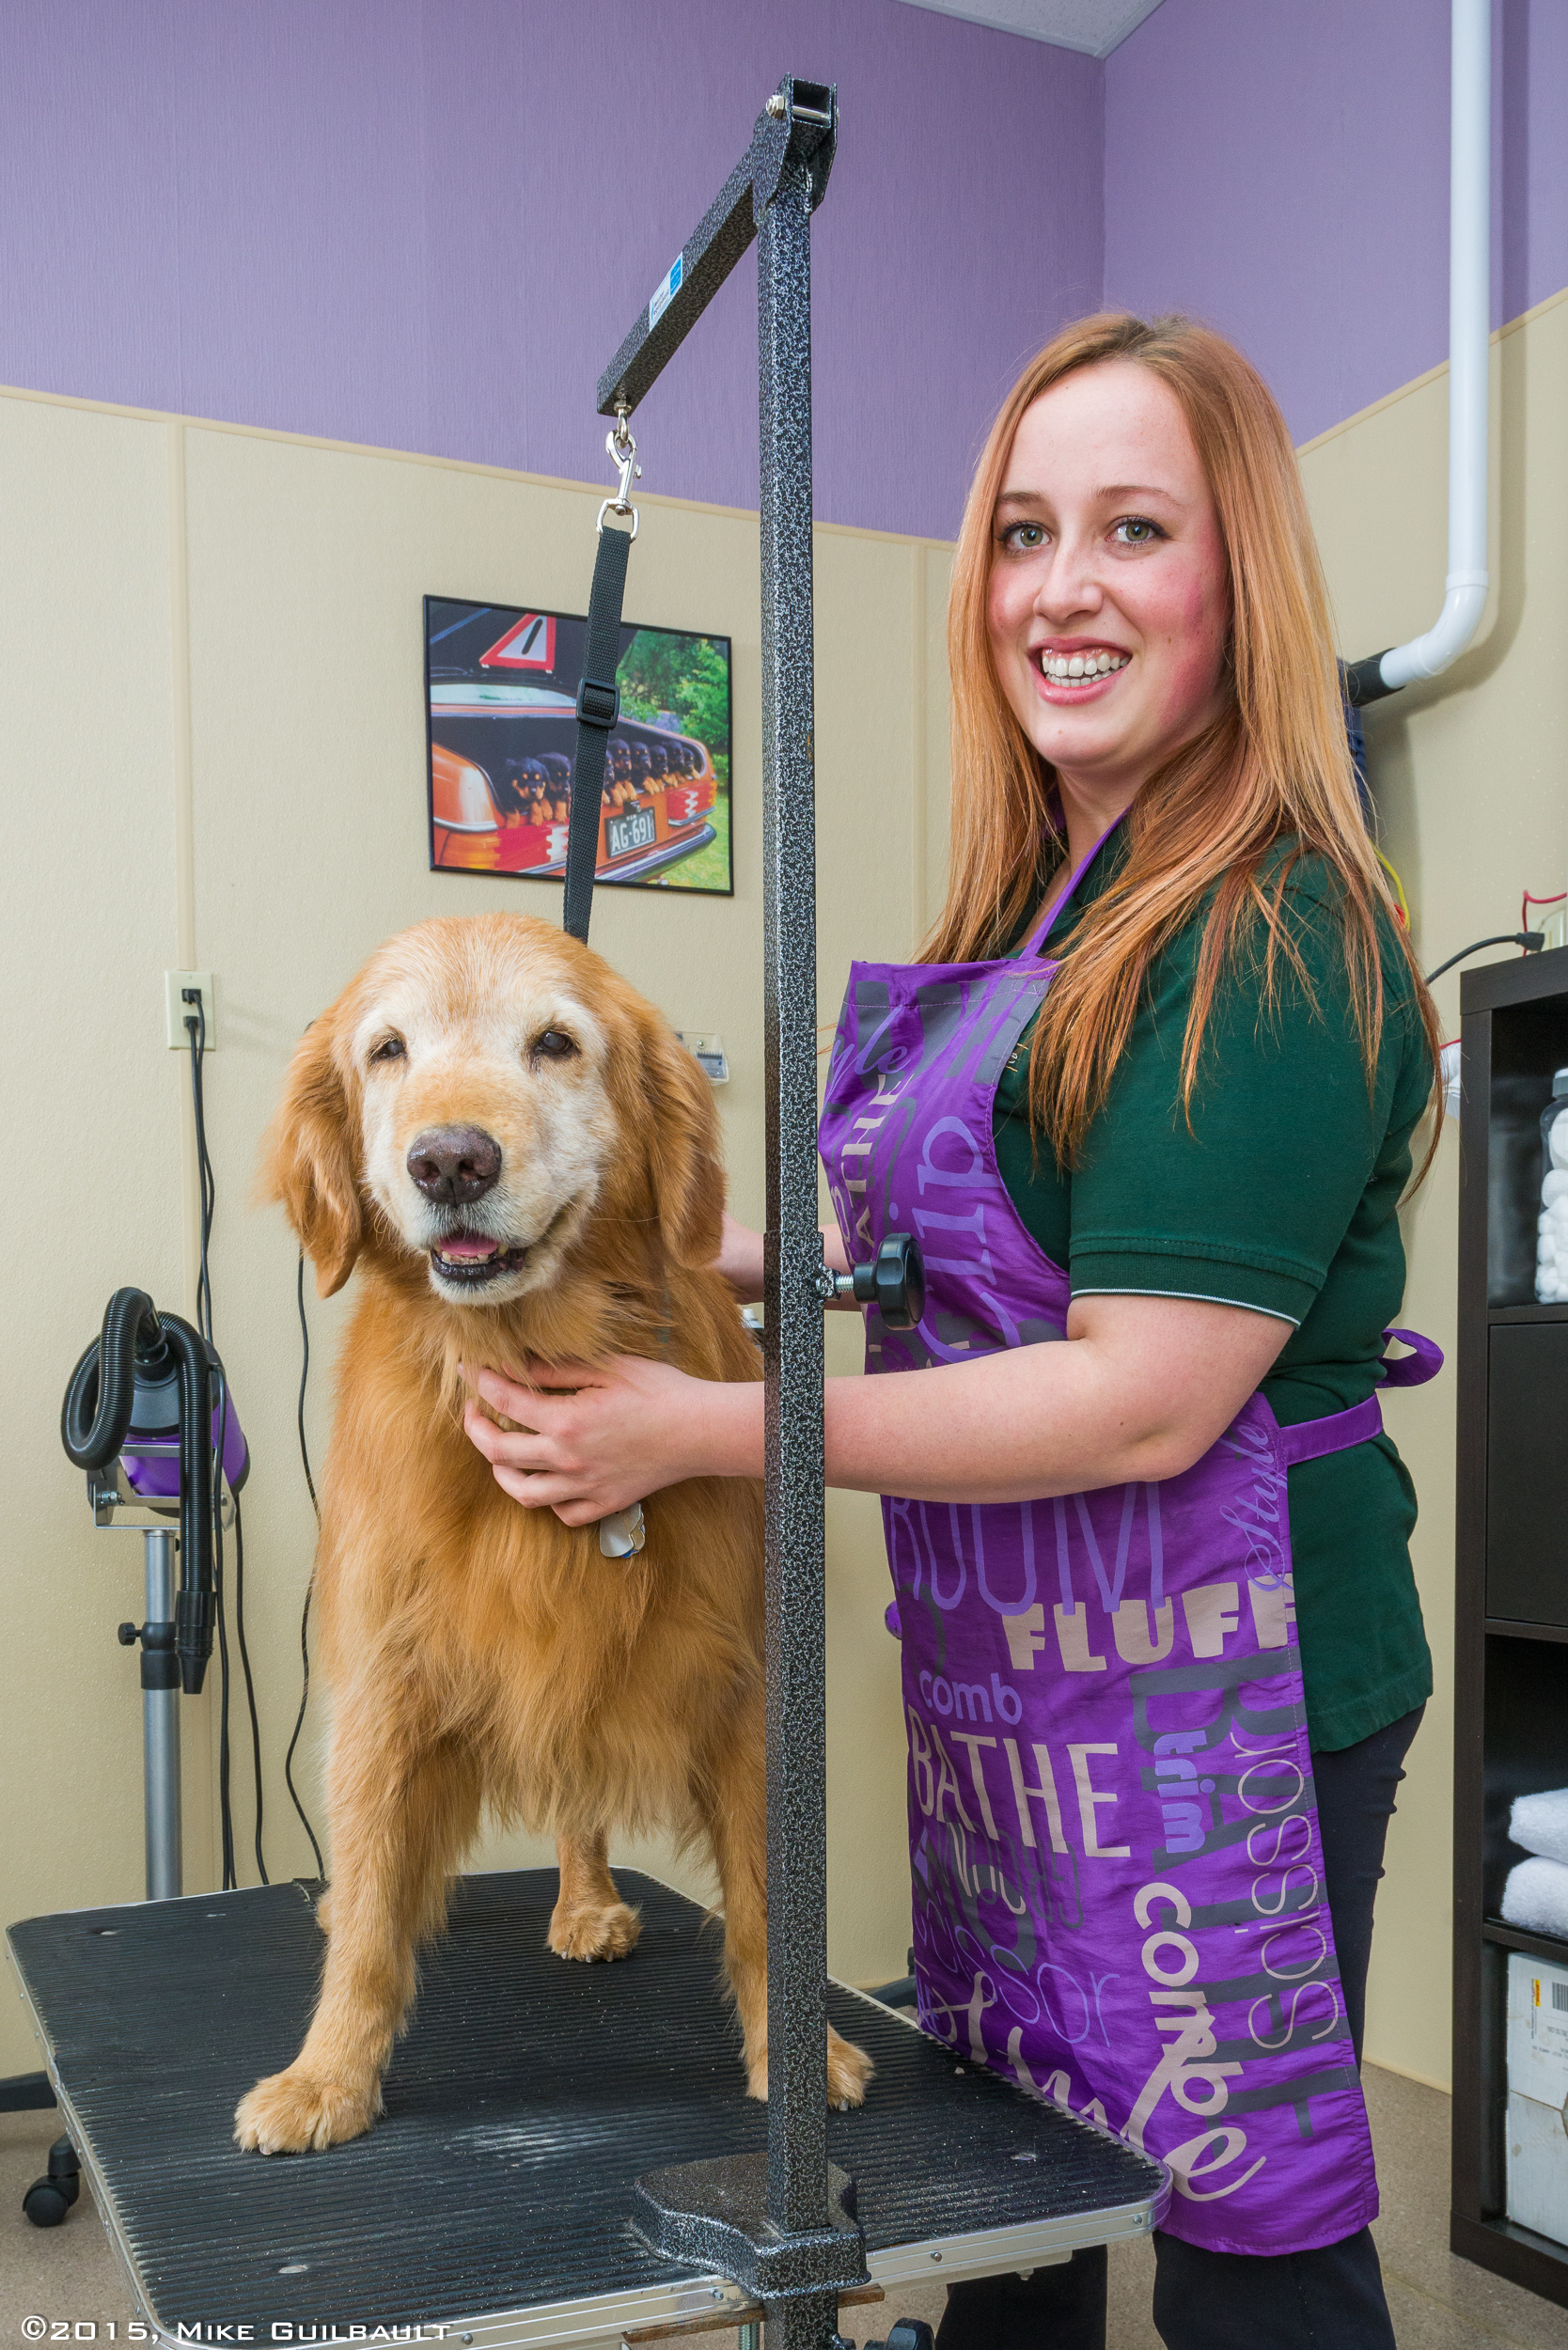 Portrait of a dog groomer